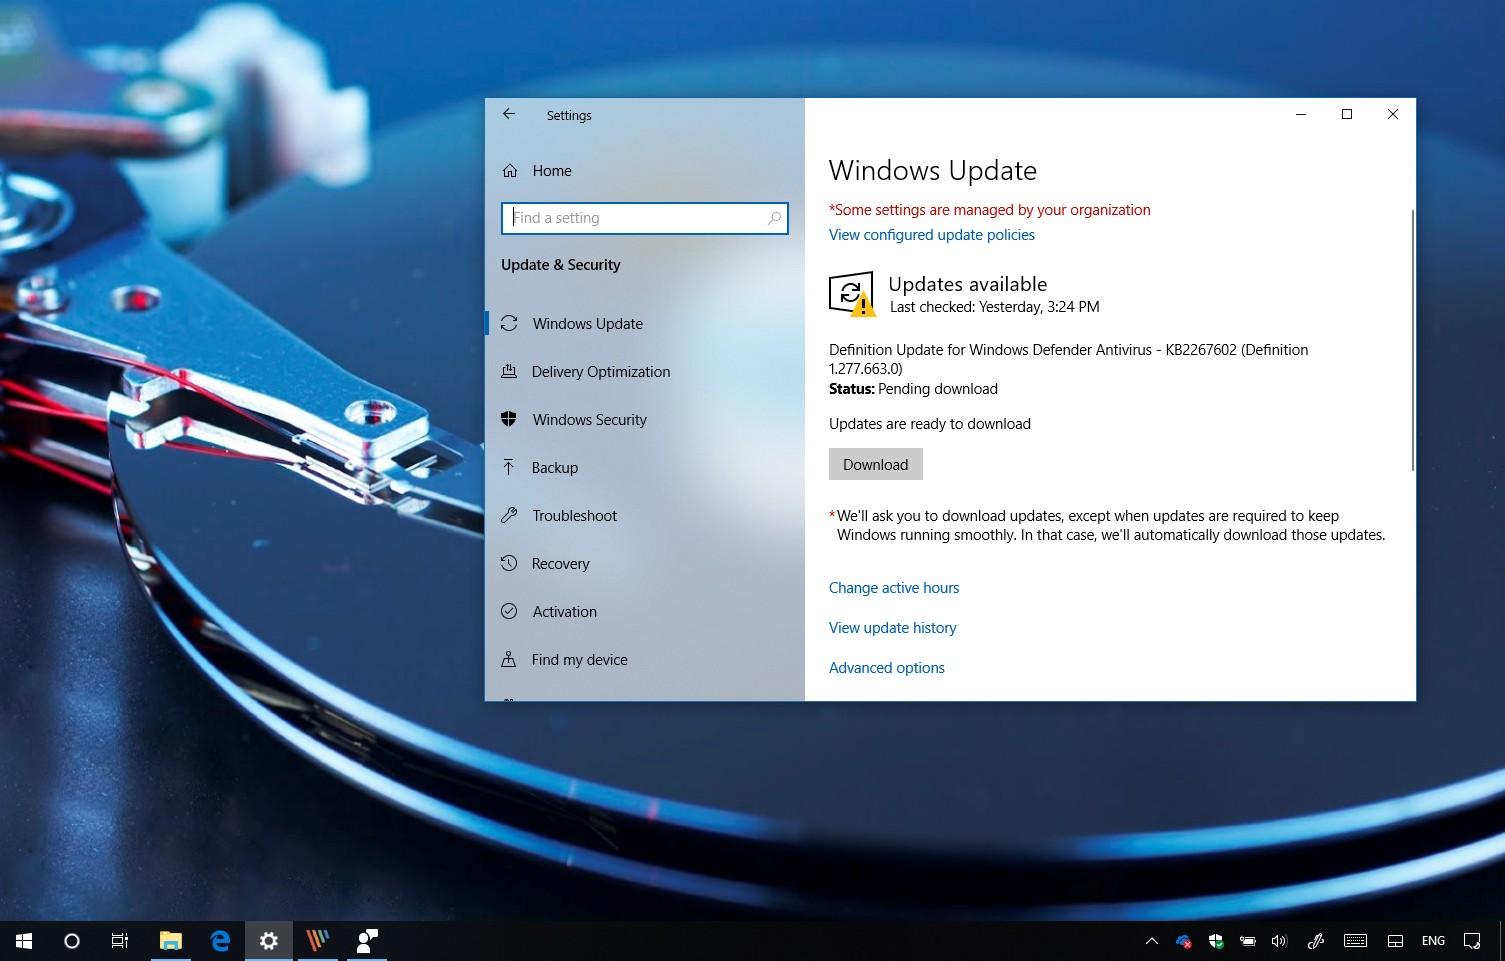 Windows 10 version 1809 deletes user files